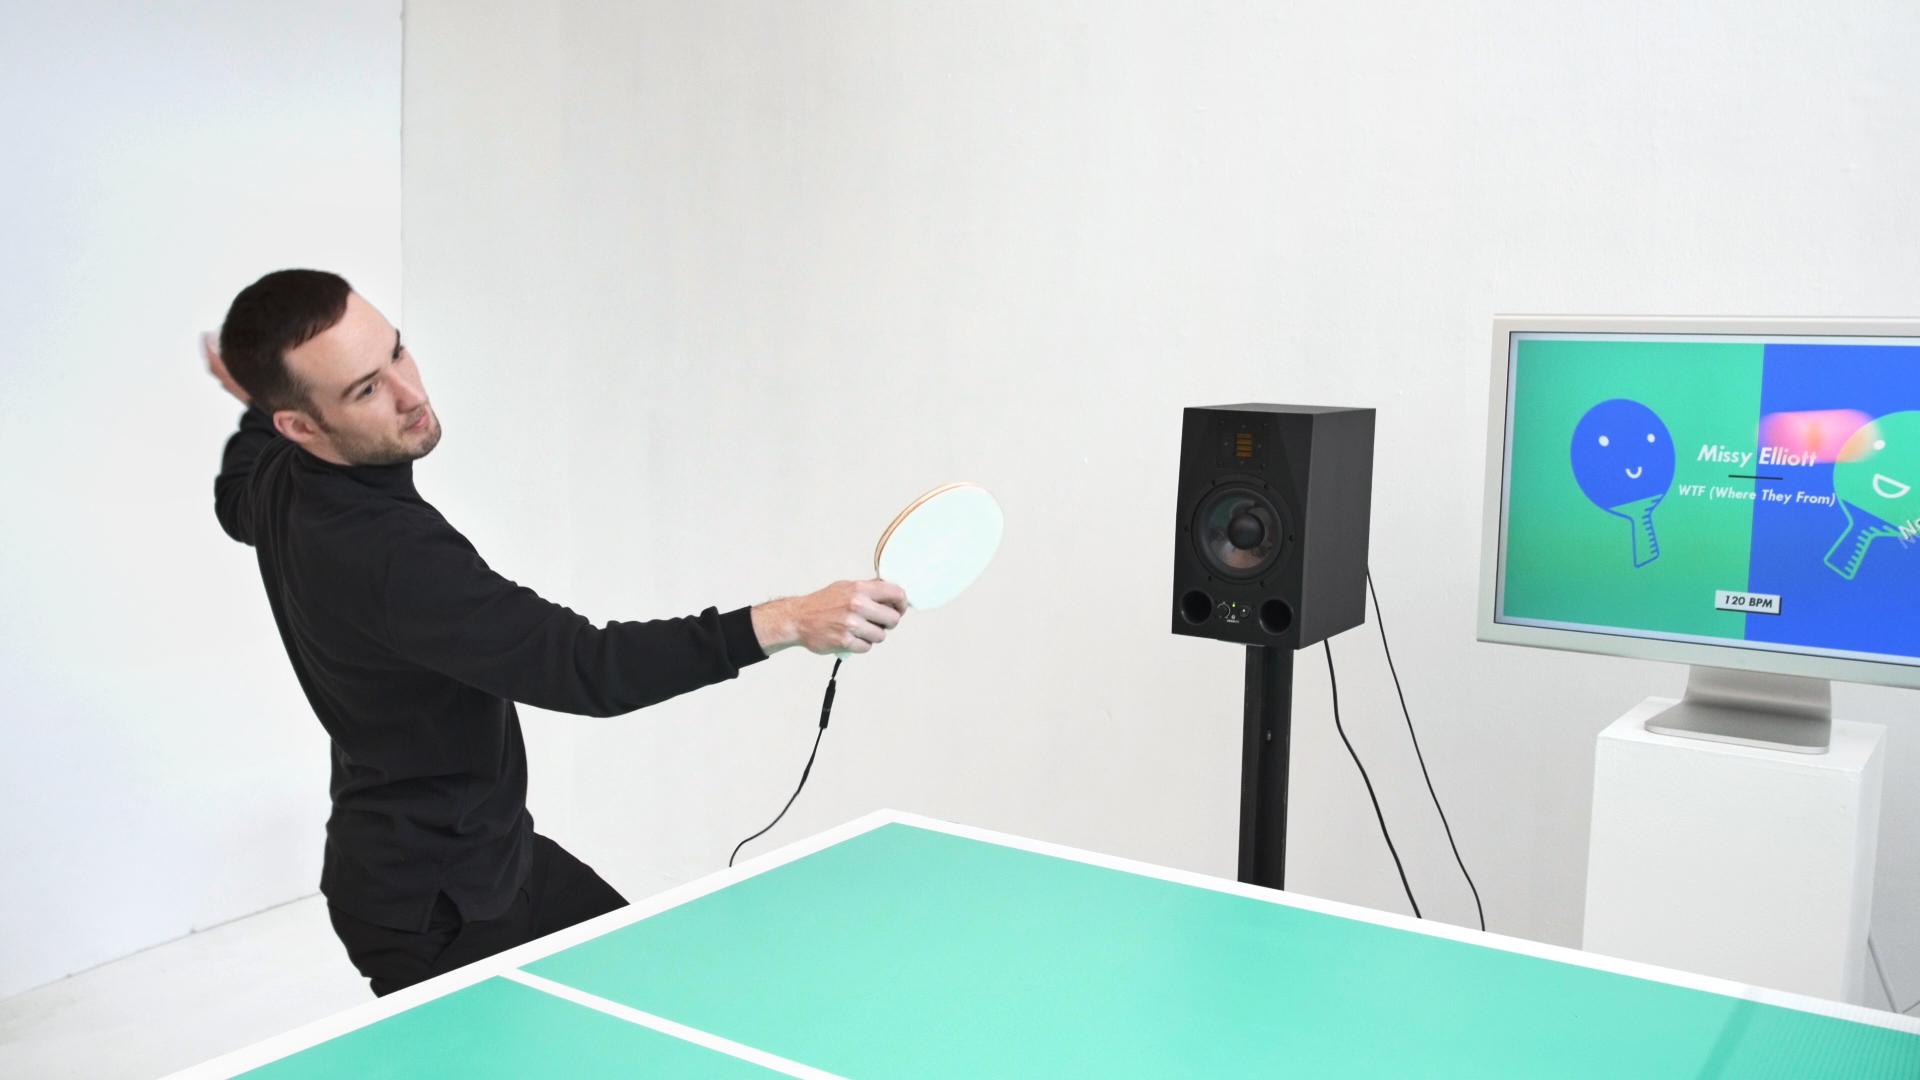 ping-pong-fm-08.jpg